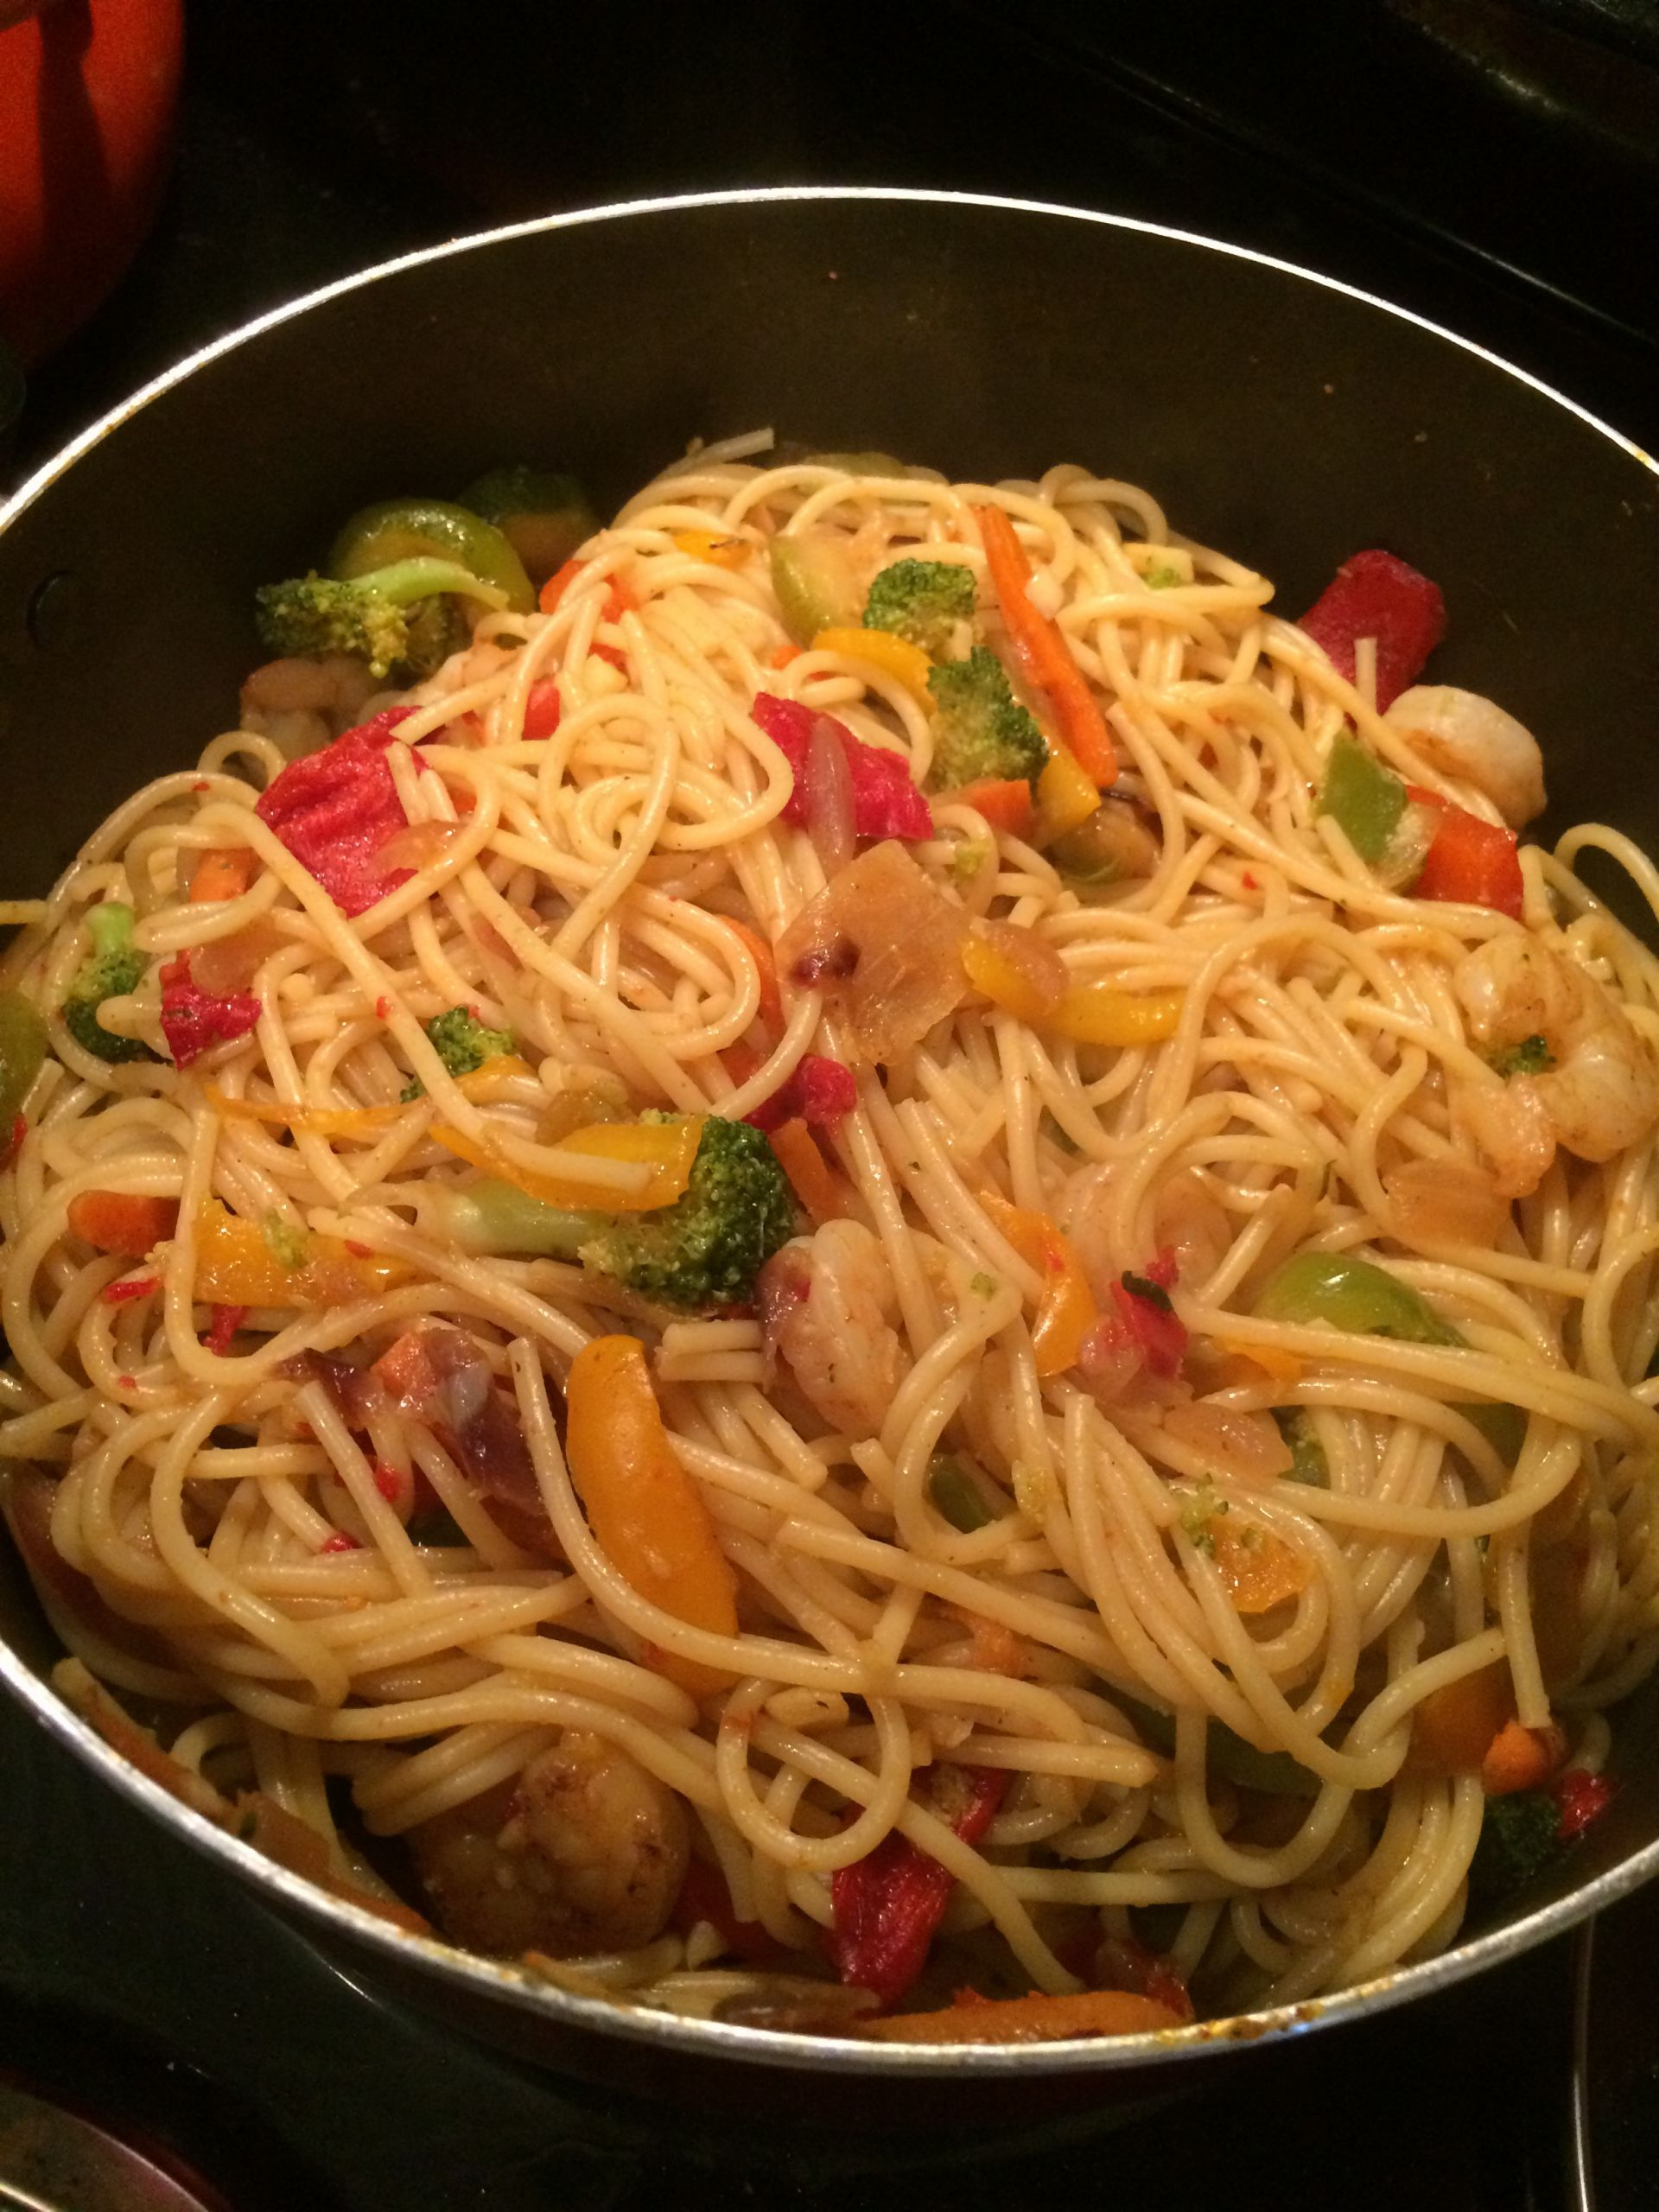 Stir Fry Spaghetti  Simple Shrimp and Noodle Stir Fry Ev s Eats